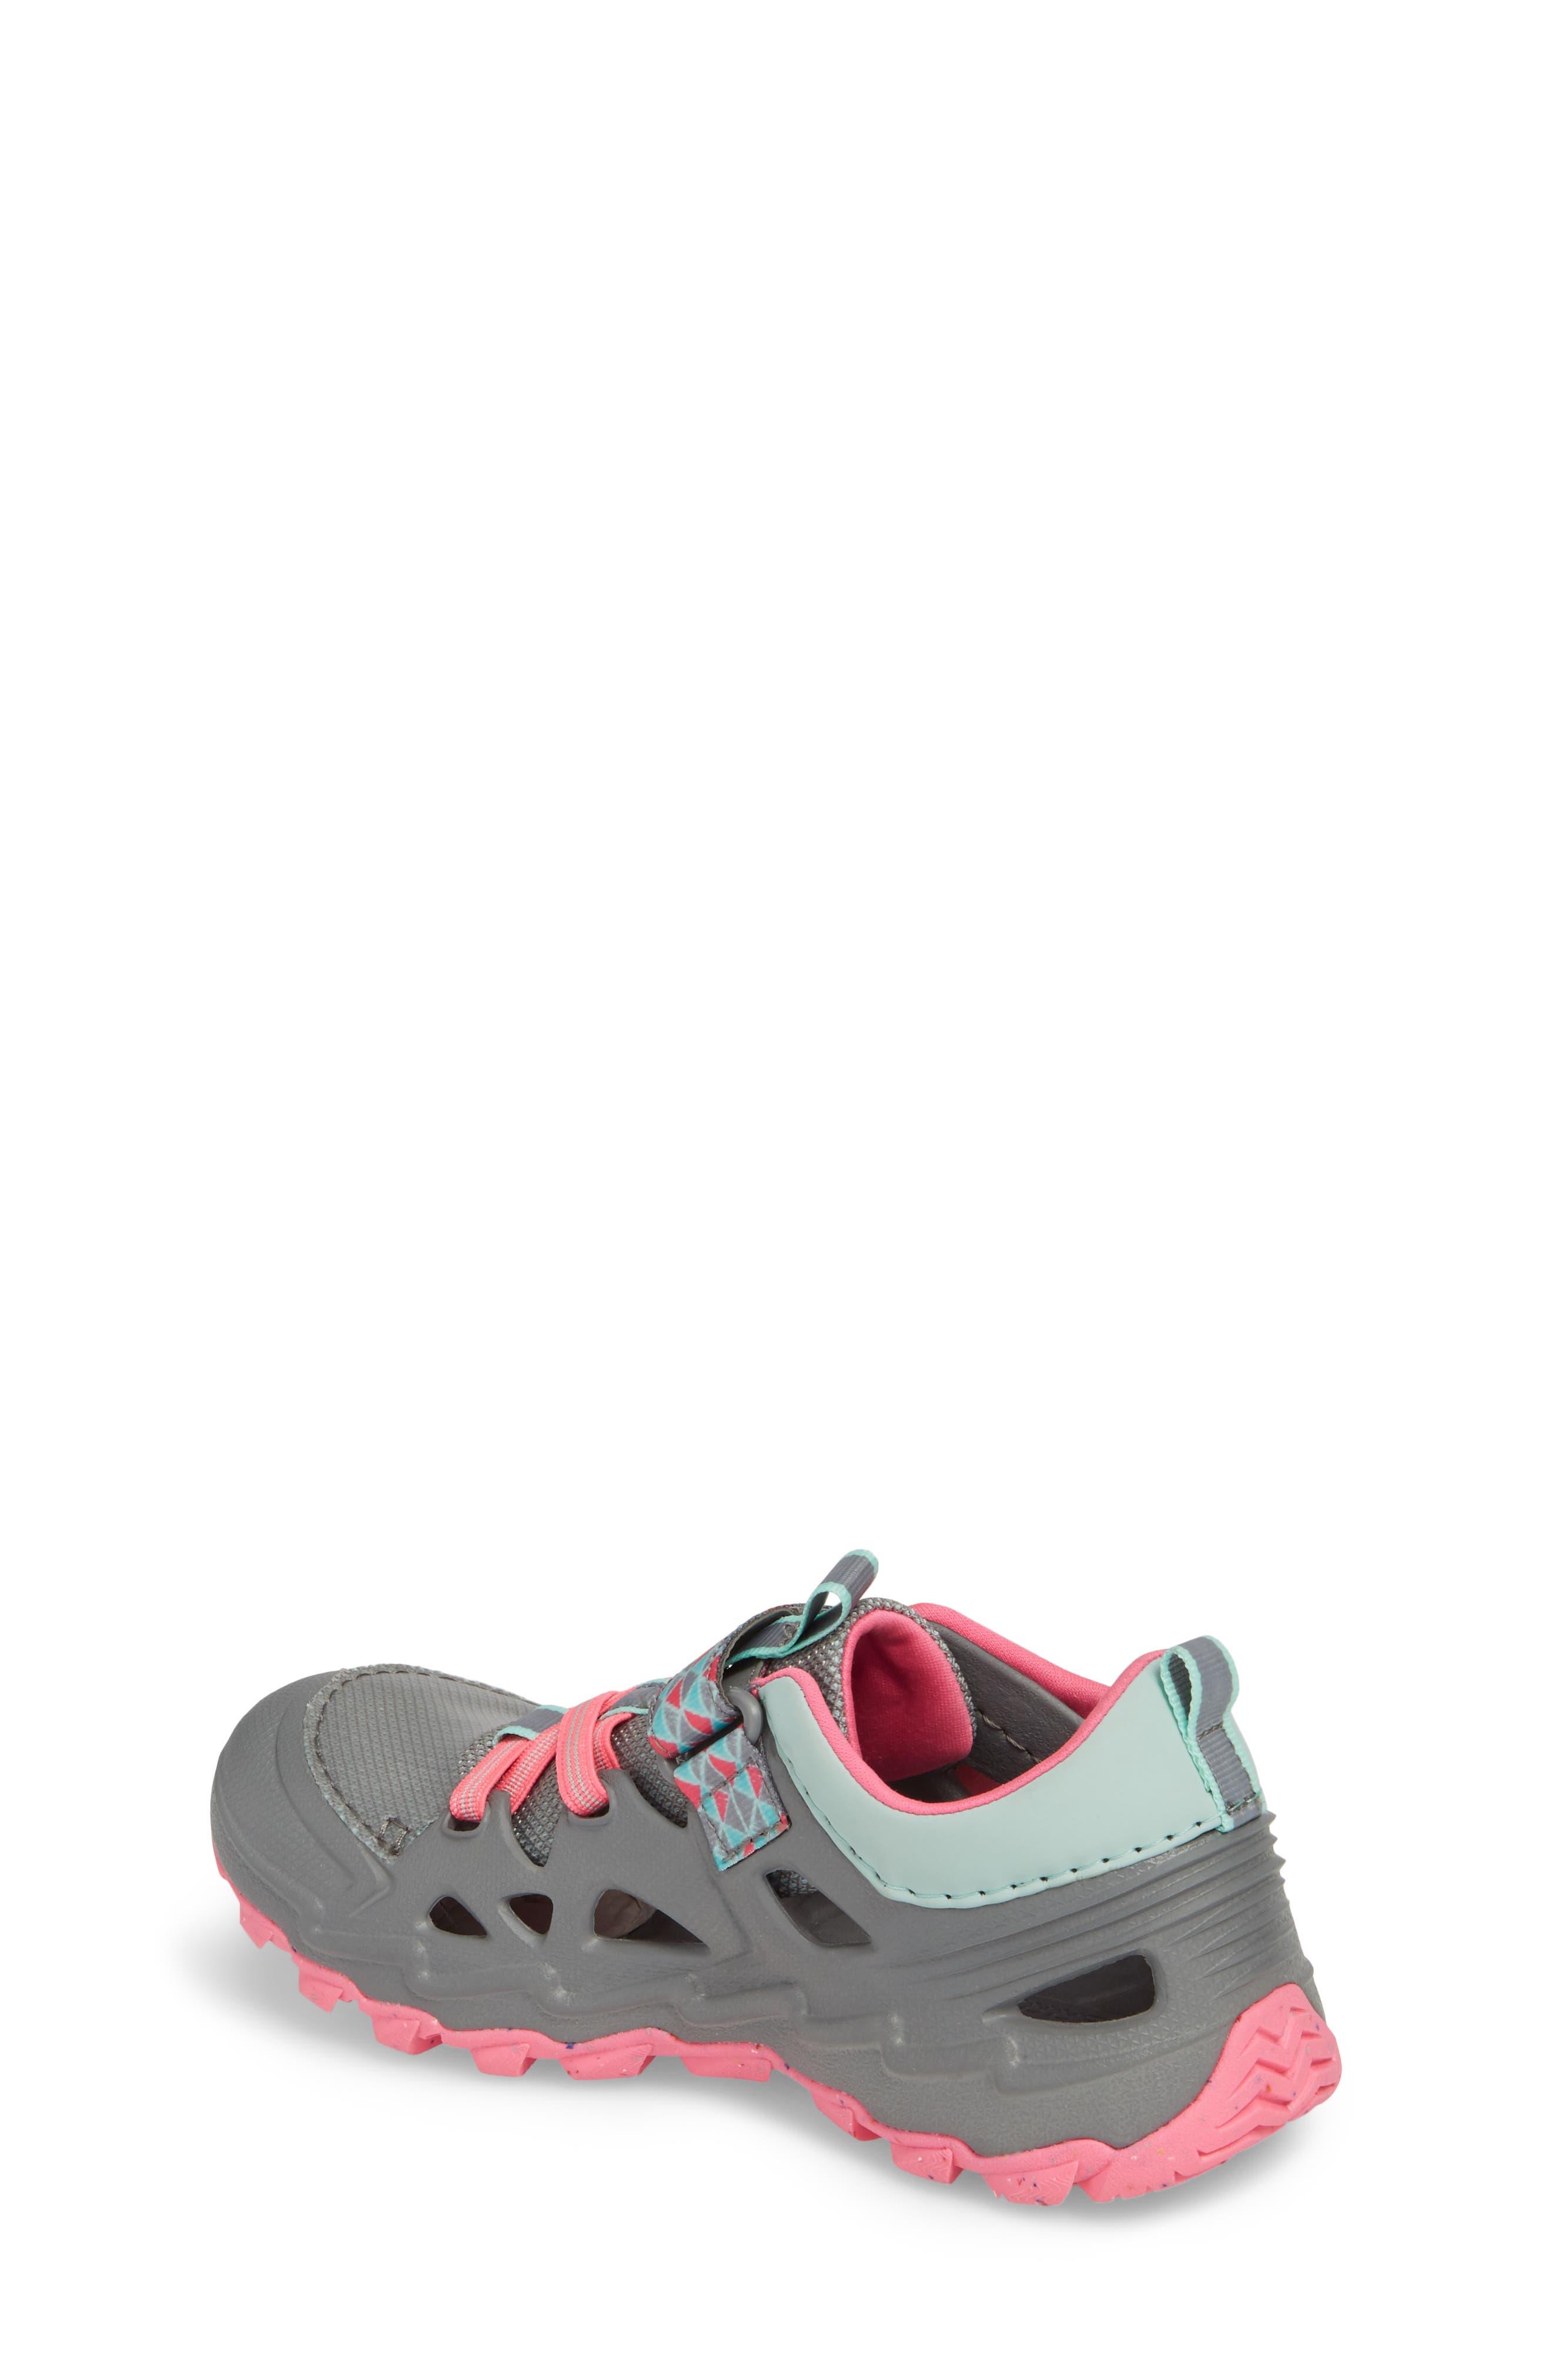 Hydro 2.0 Water Friendly Sneaker,                             Alternate thumbnail 2, color,                             Grey/ Multi